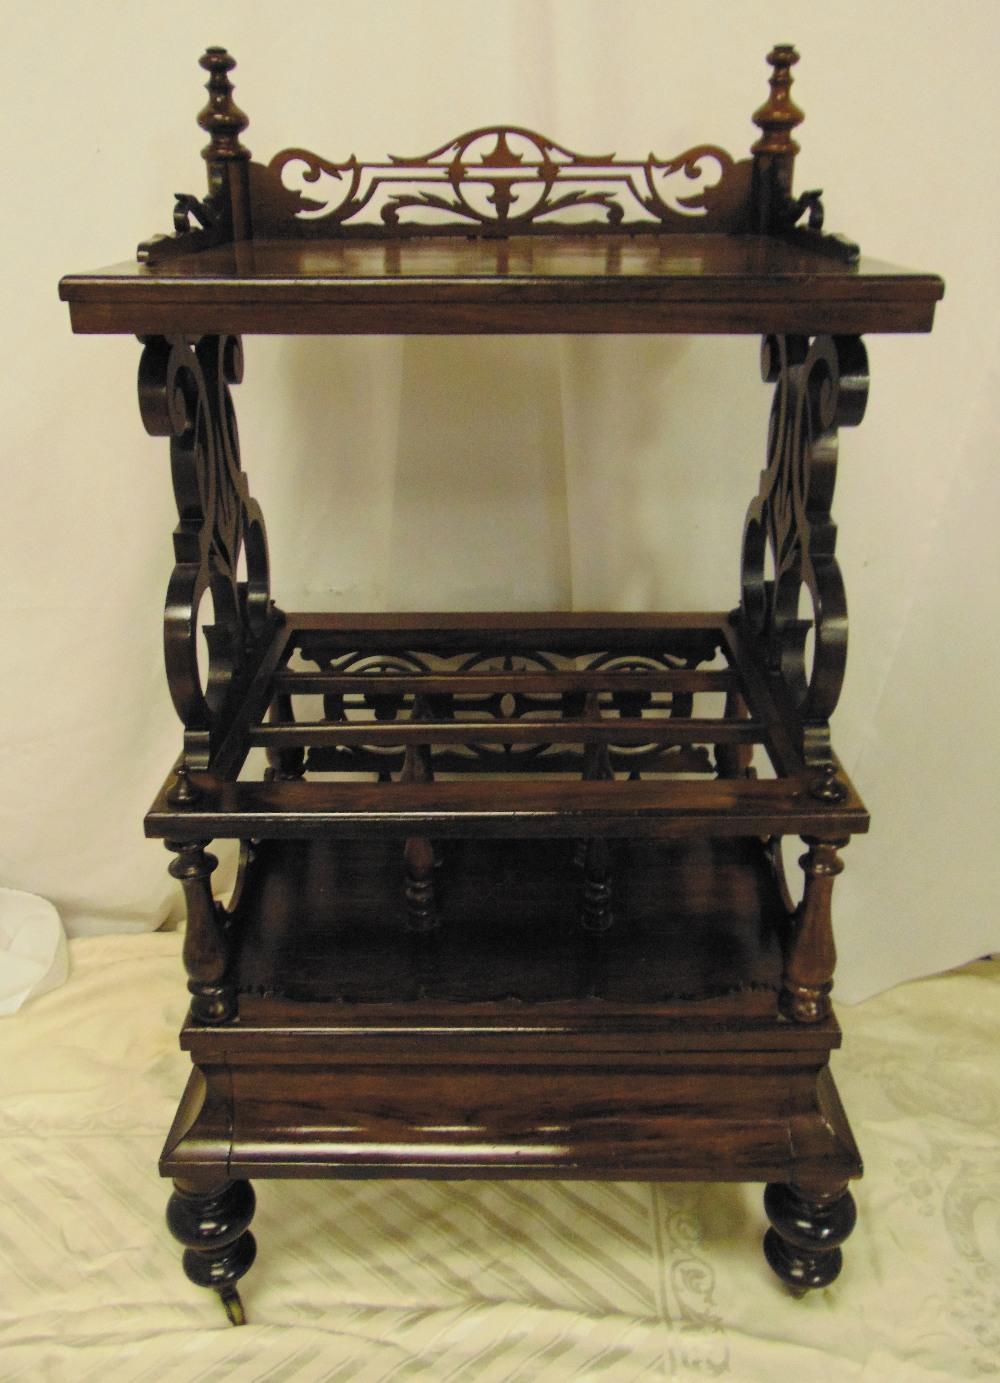 A Victorian mahogany rectangular whatnot cum magazine rack with pierced scroll sides on four bun